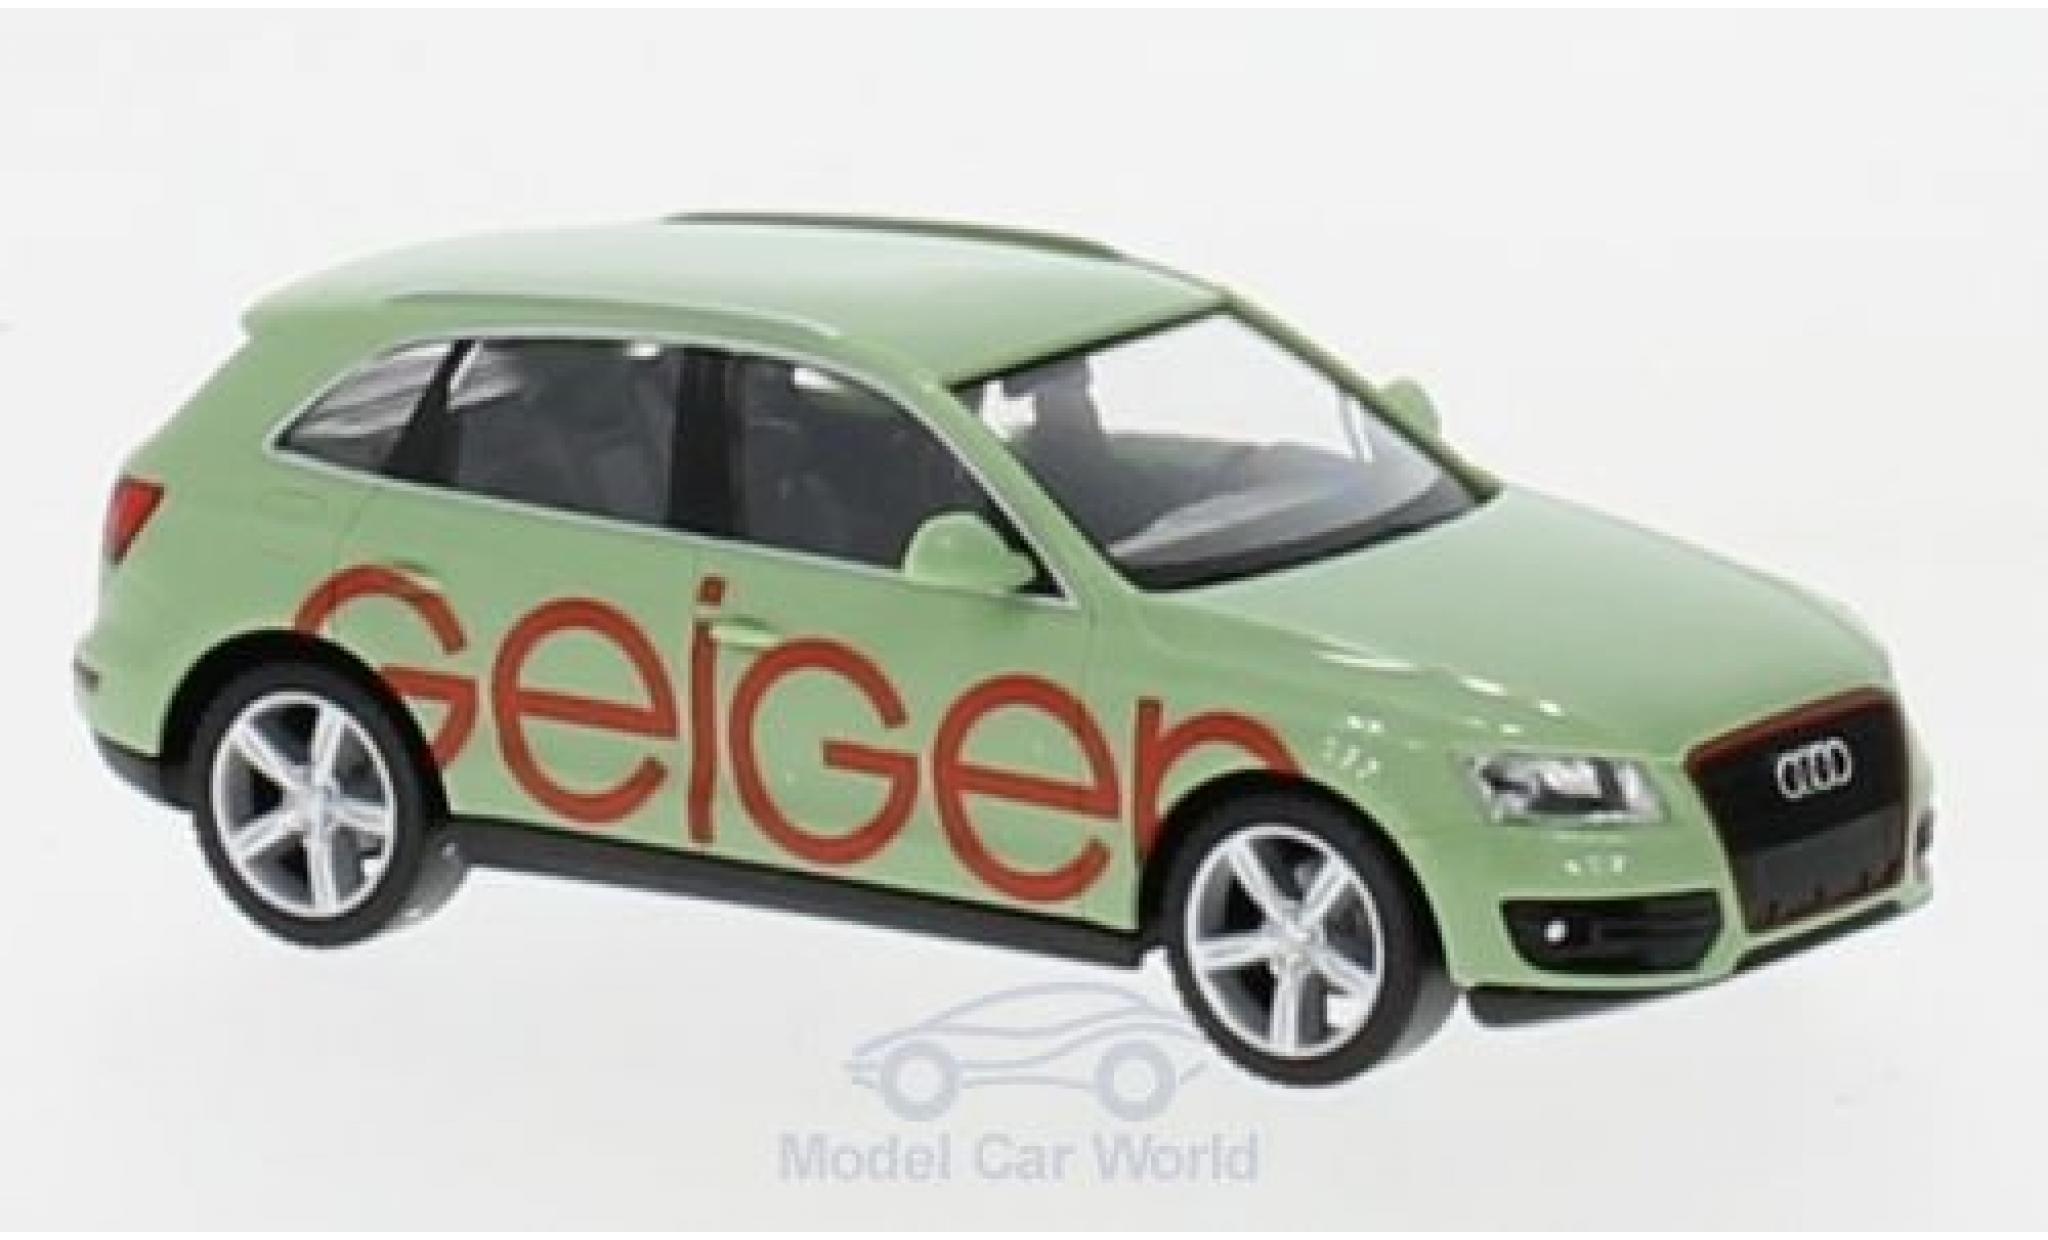 Audi Q5 1/87 Herpa Geiger